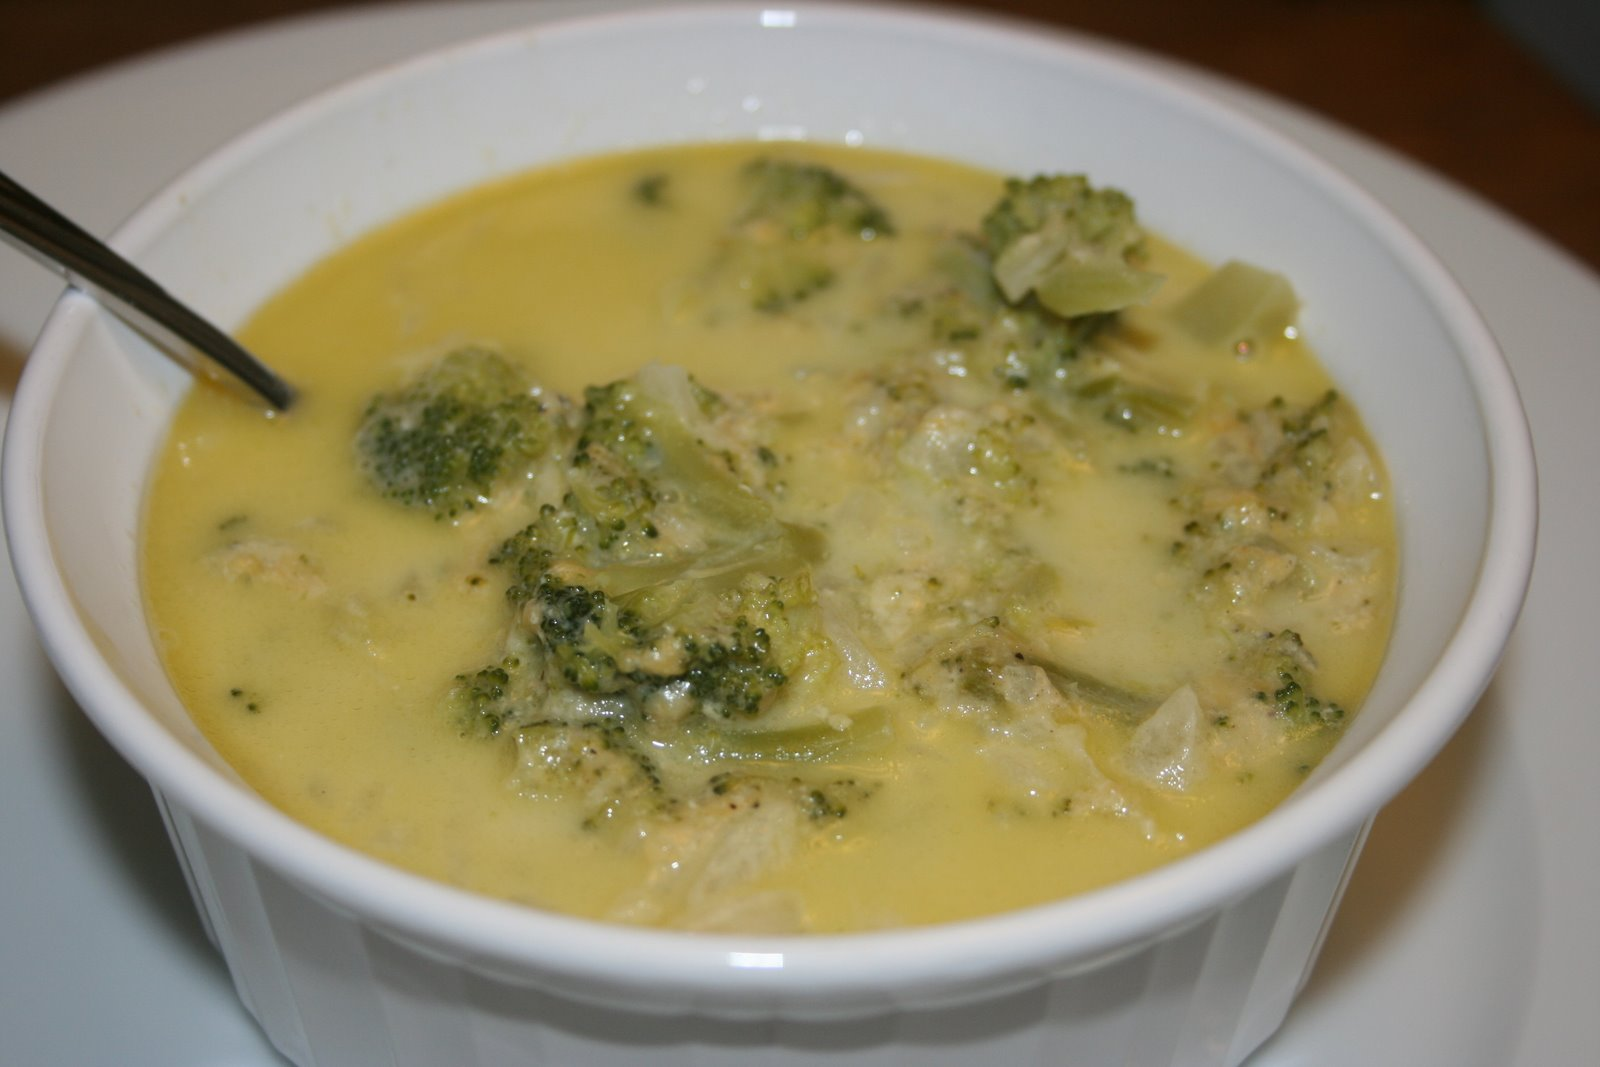 ... Monday: Crock Pot Broccoli and Three Cheese Soup   Food Tidings Blog